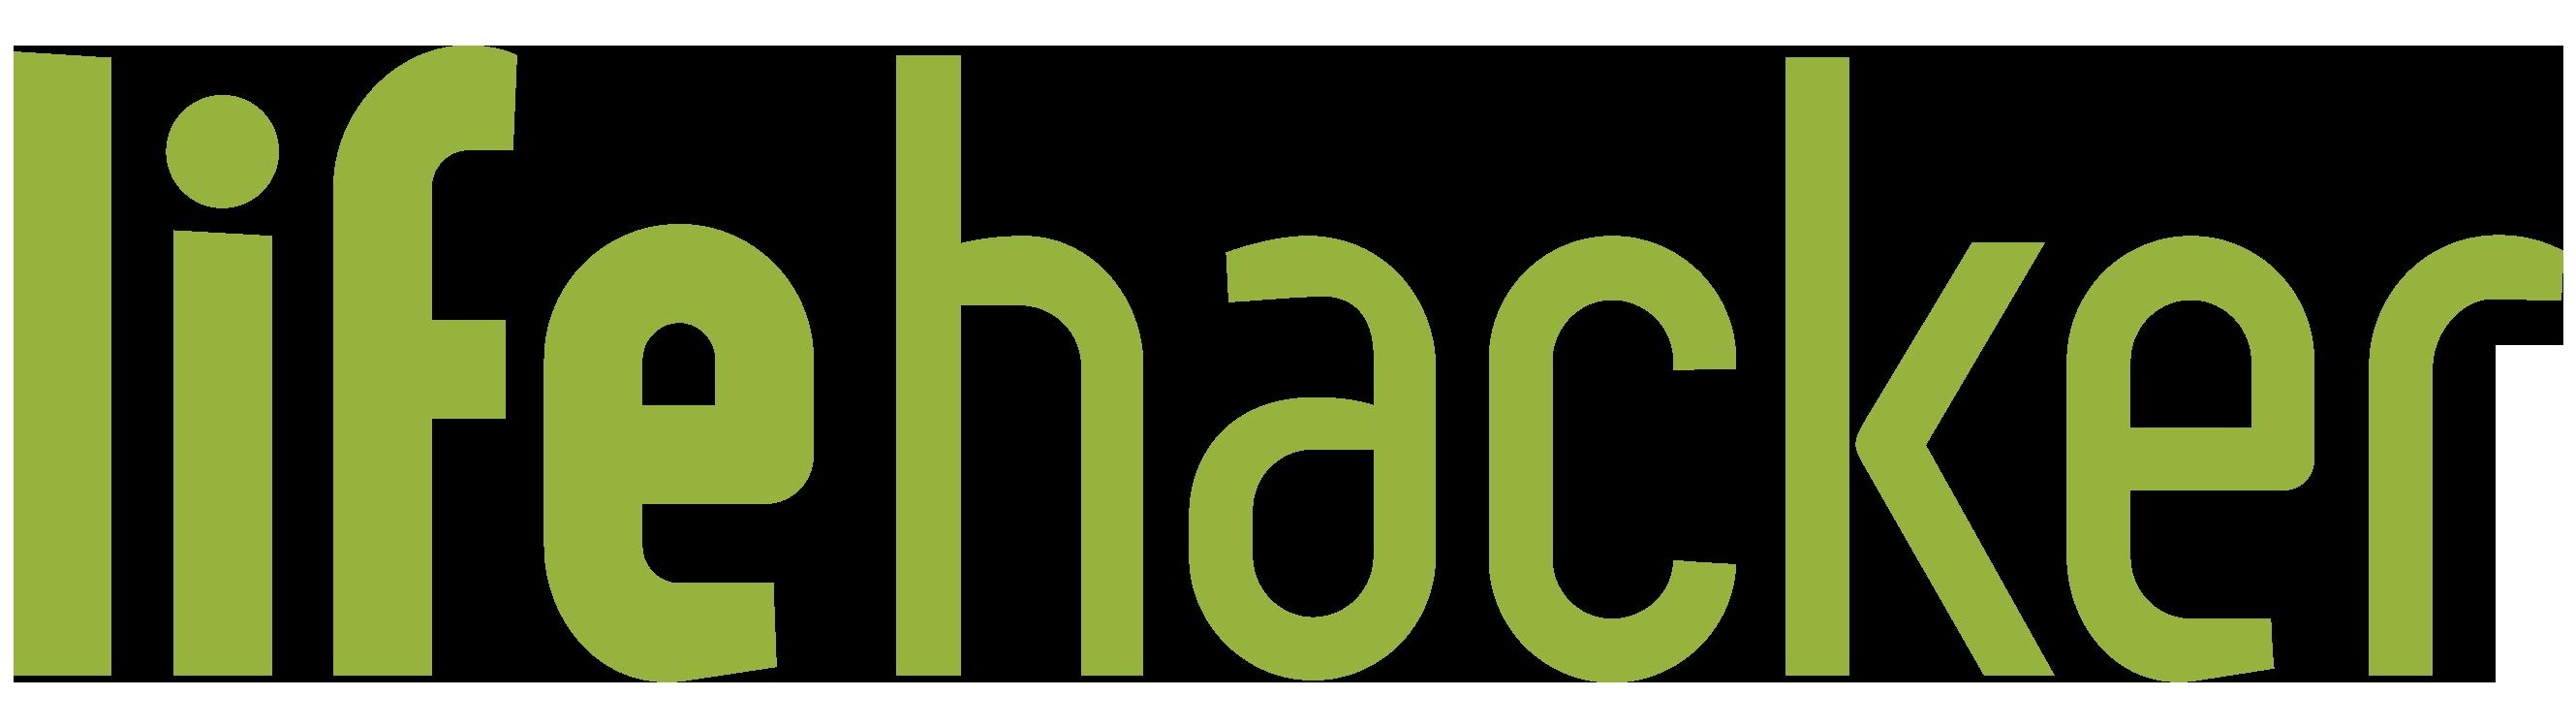 lifehacker_logo